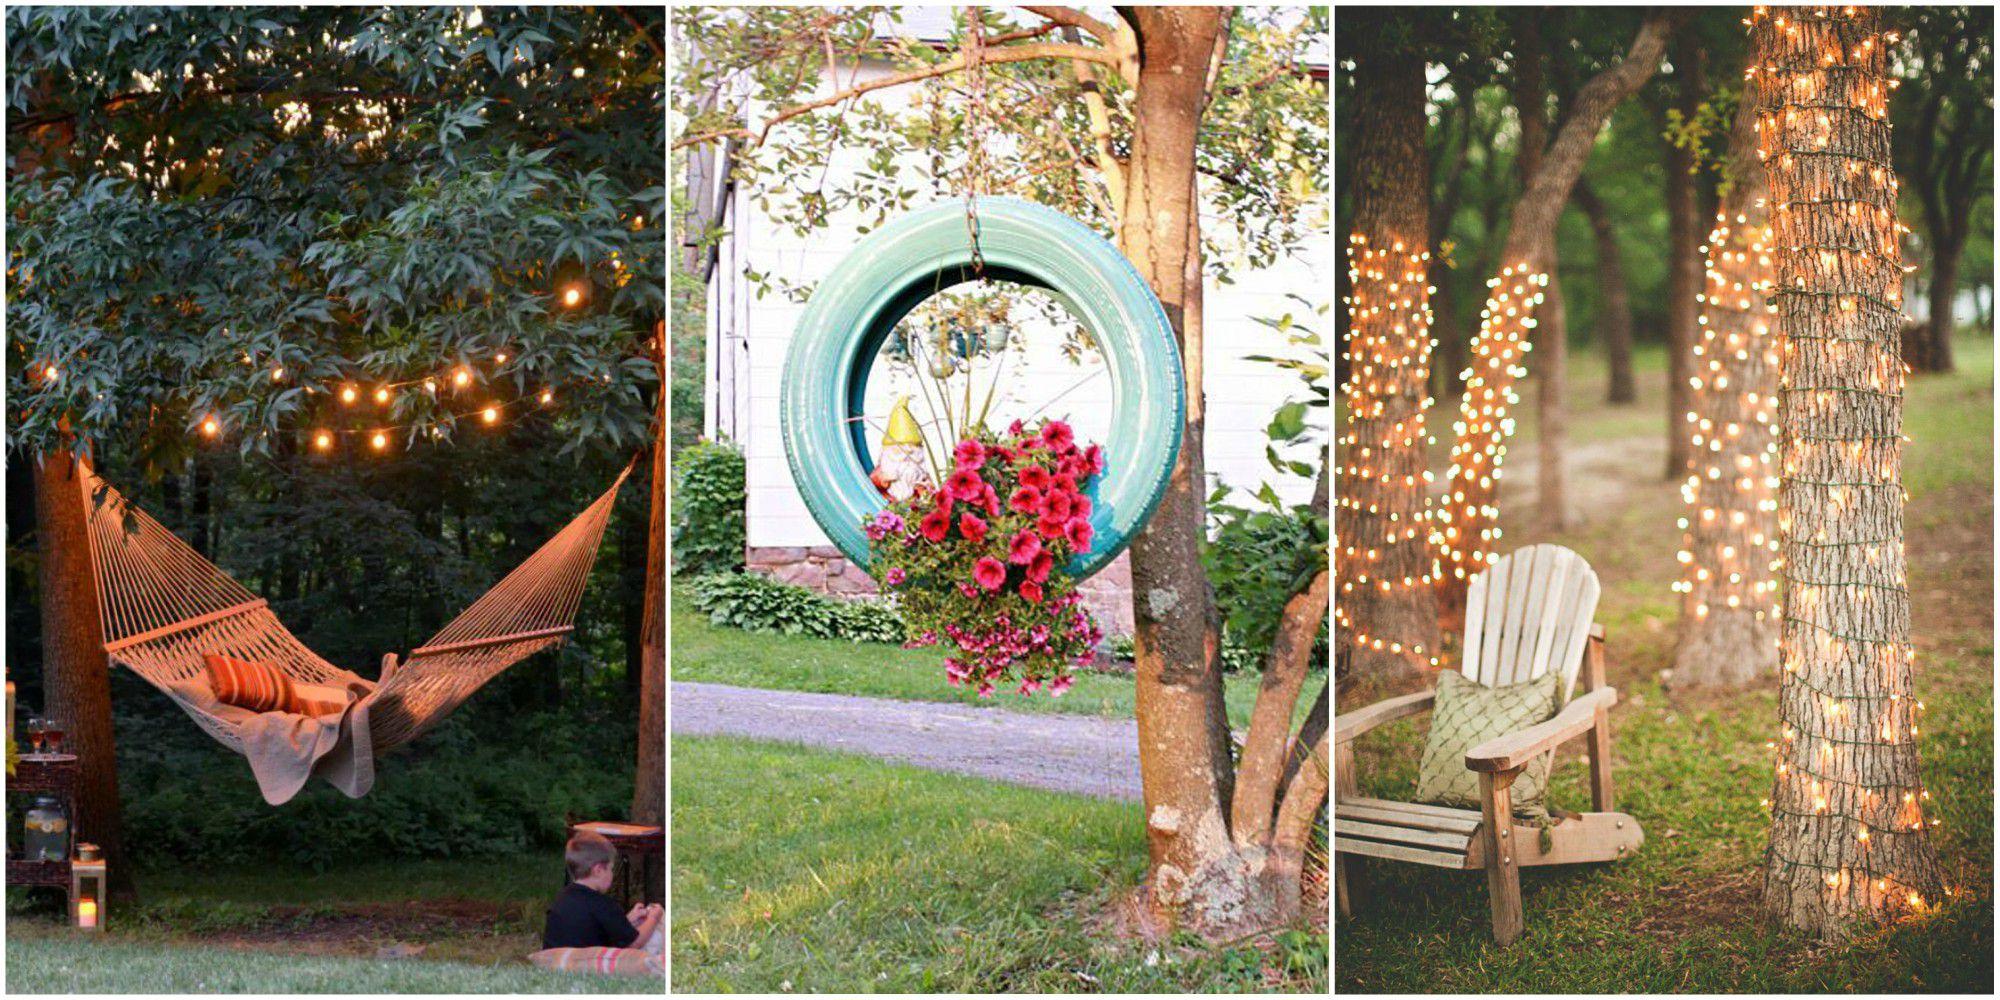 backyard garden ideas backyard decorating ideas VIVMNOG